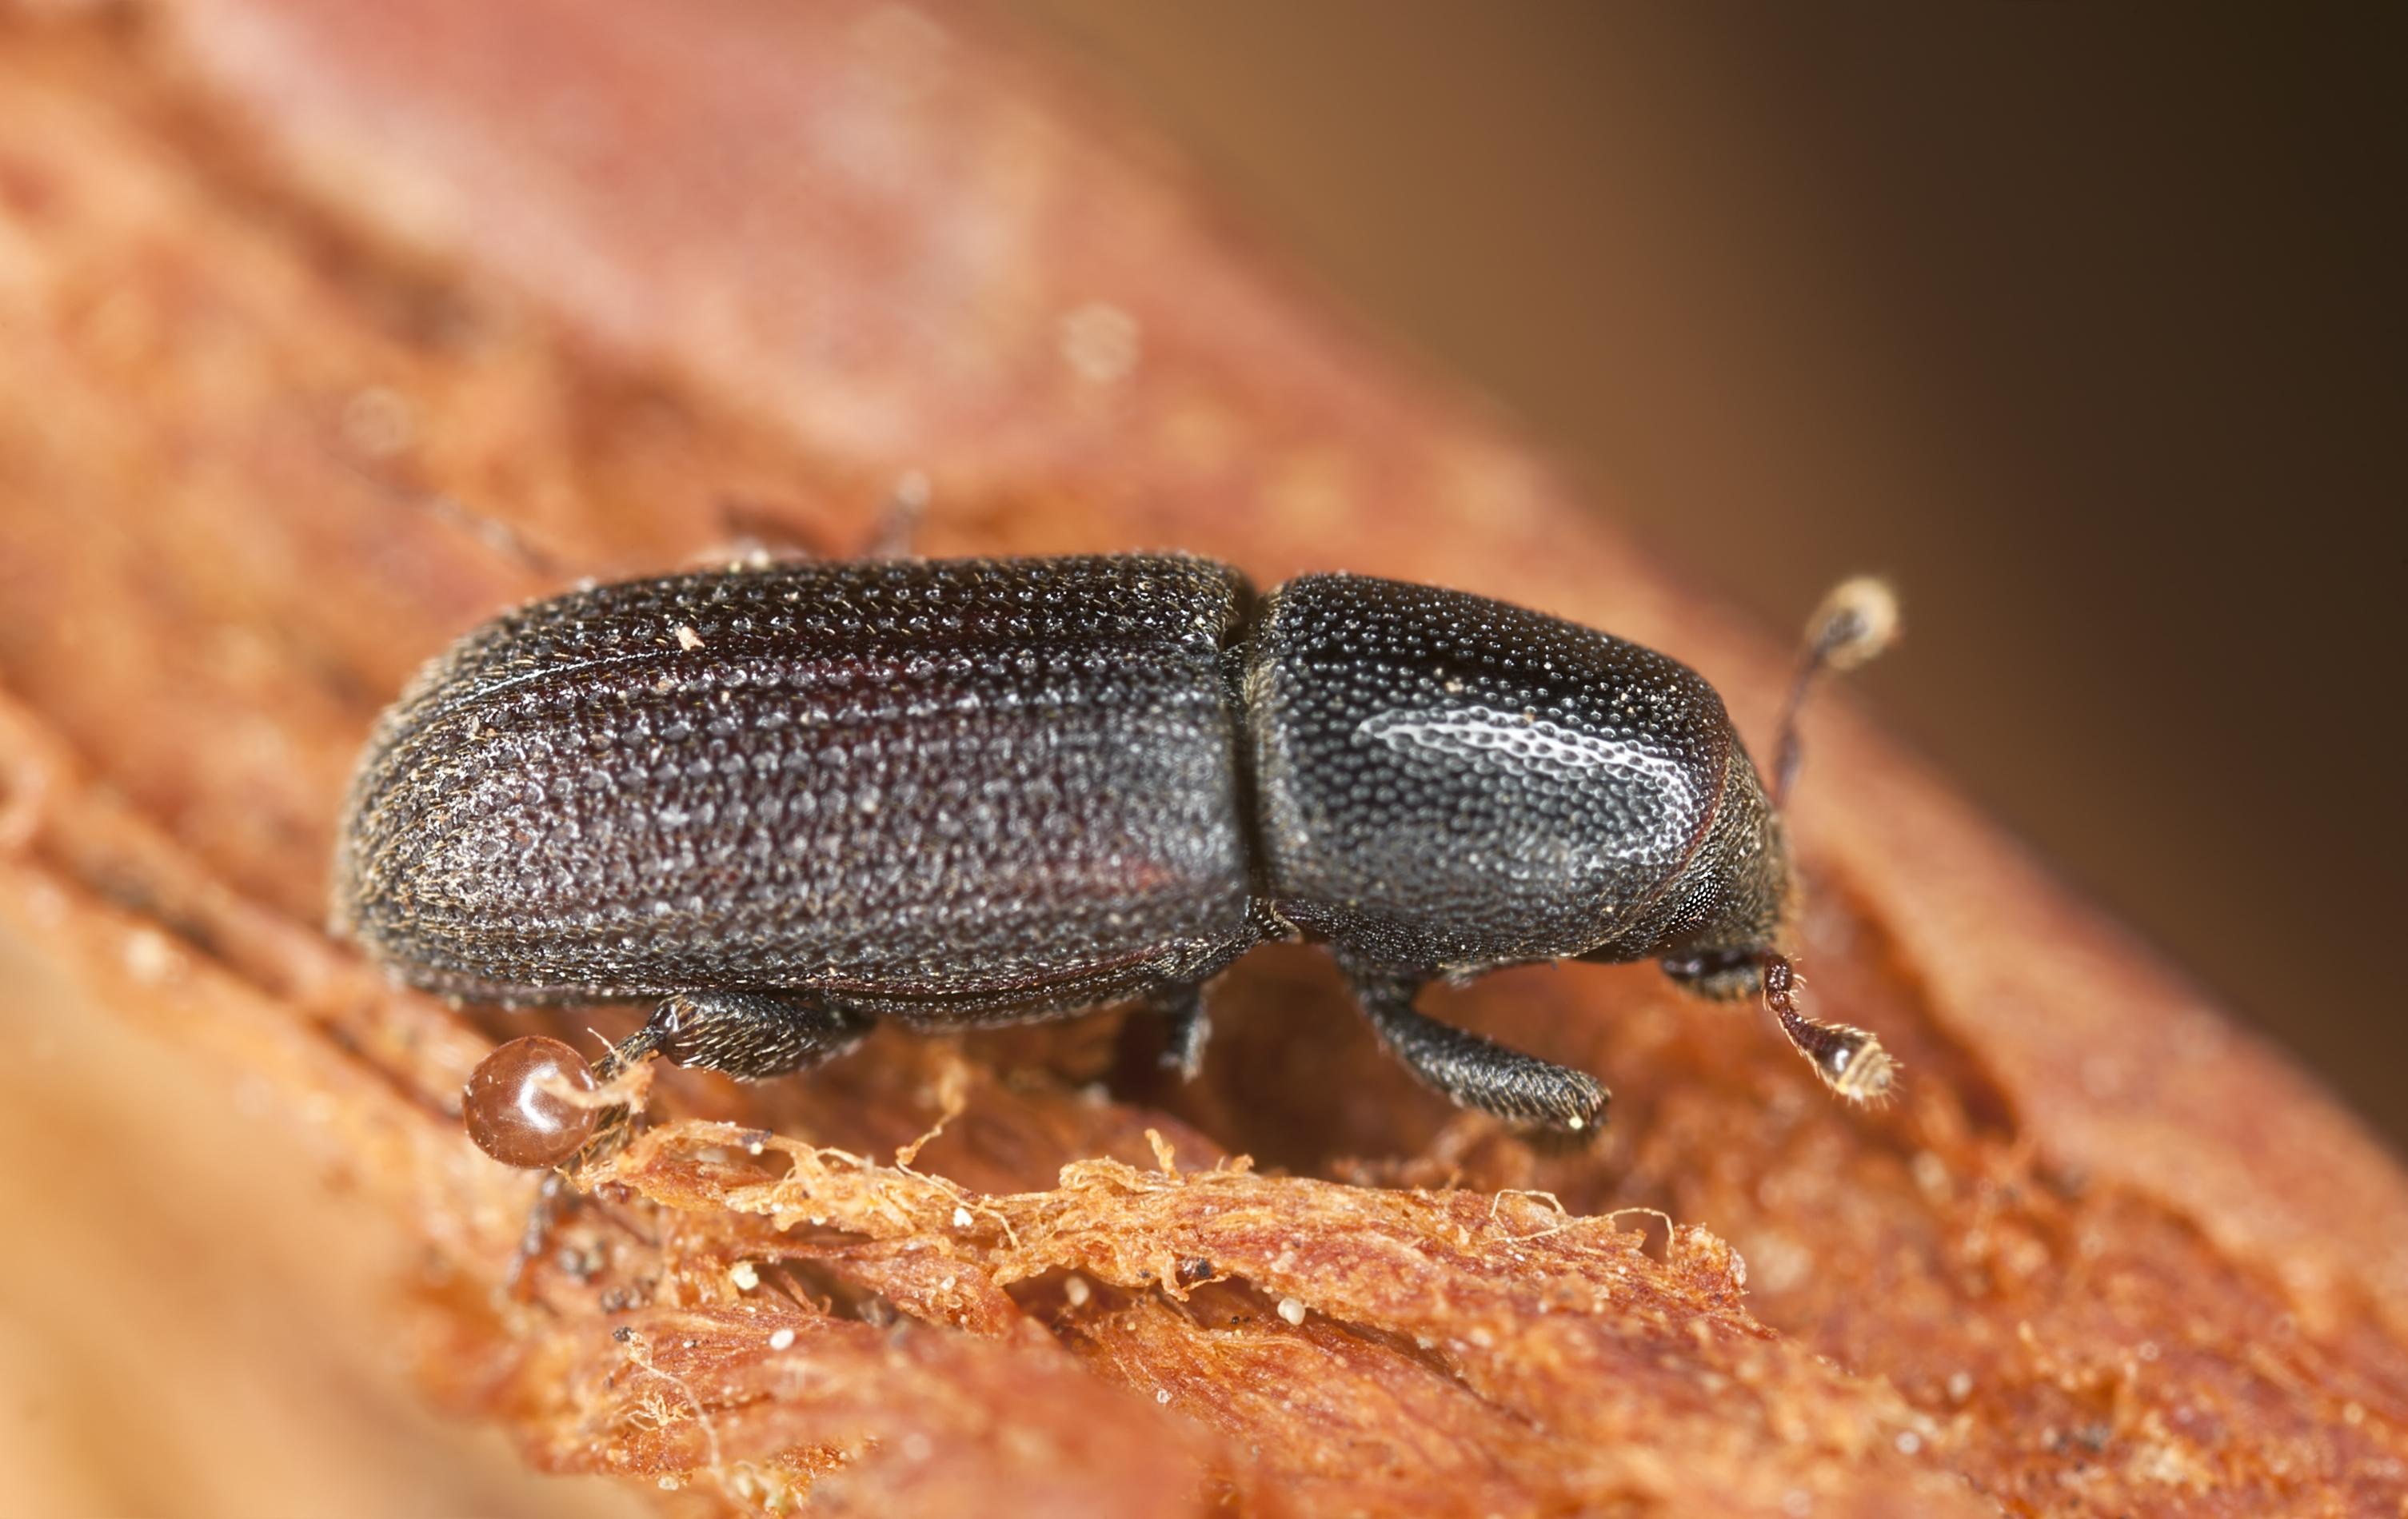 Powderpost Beetle Image 02